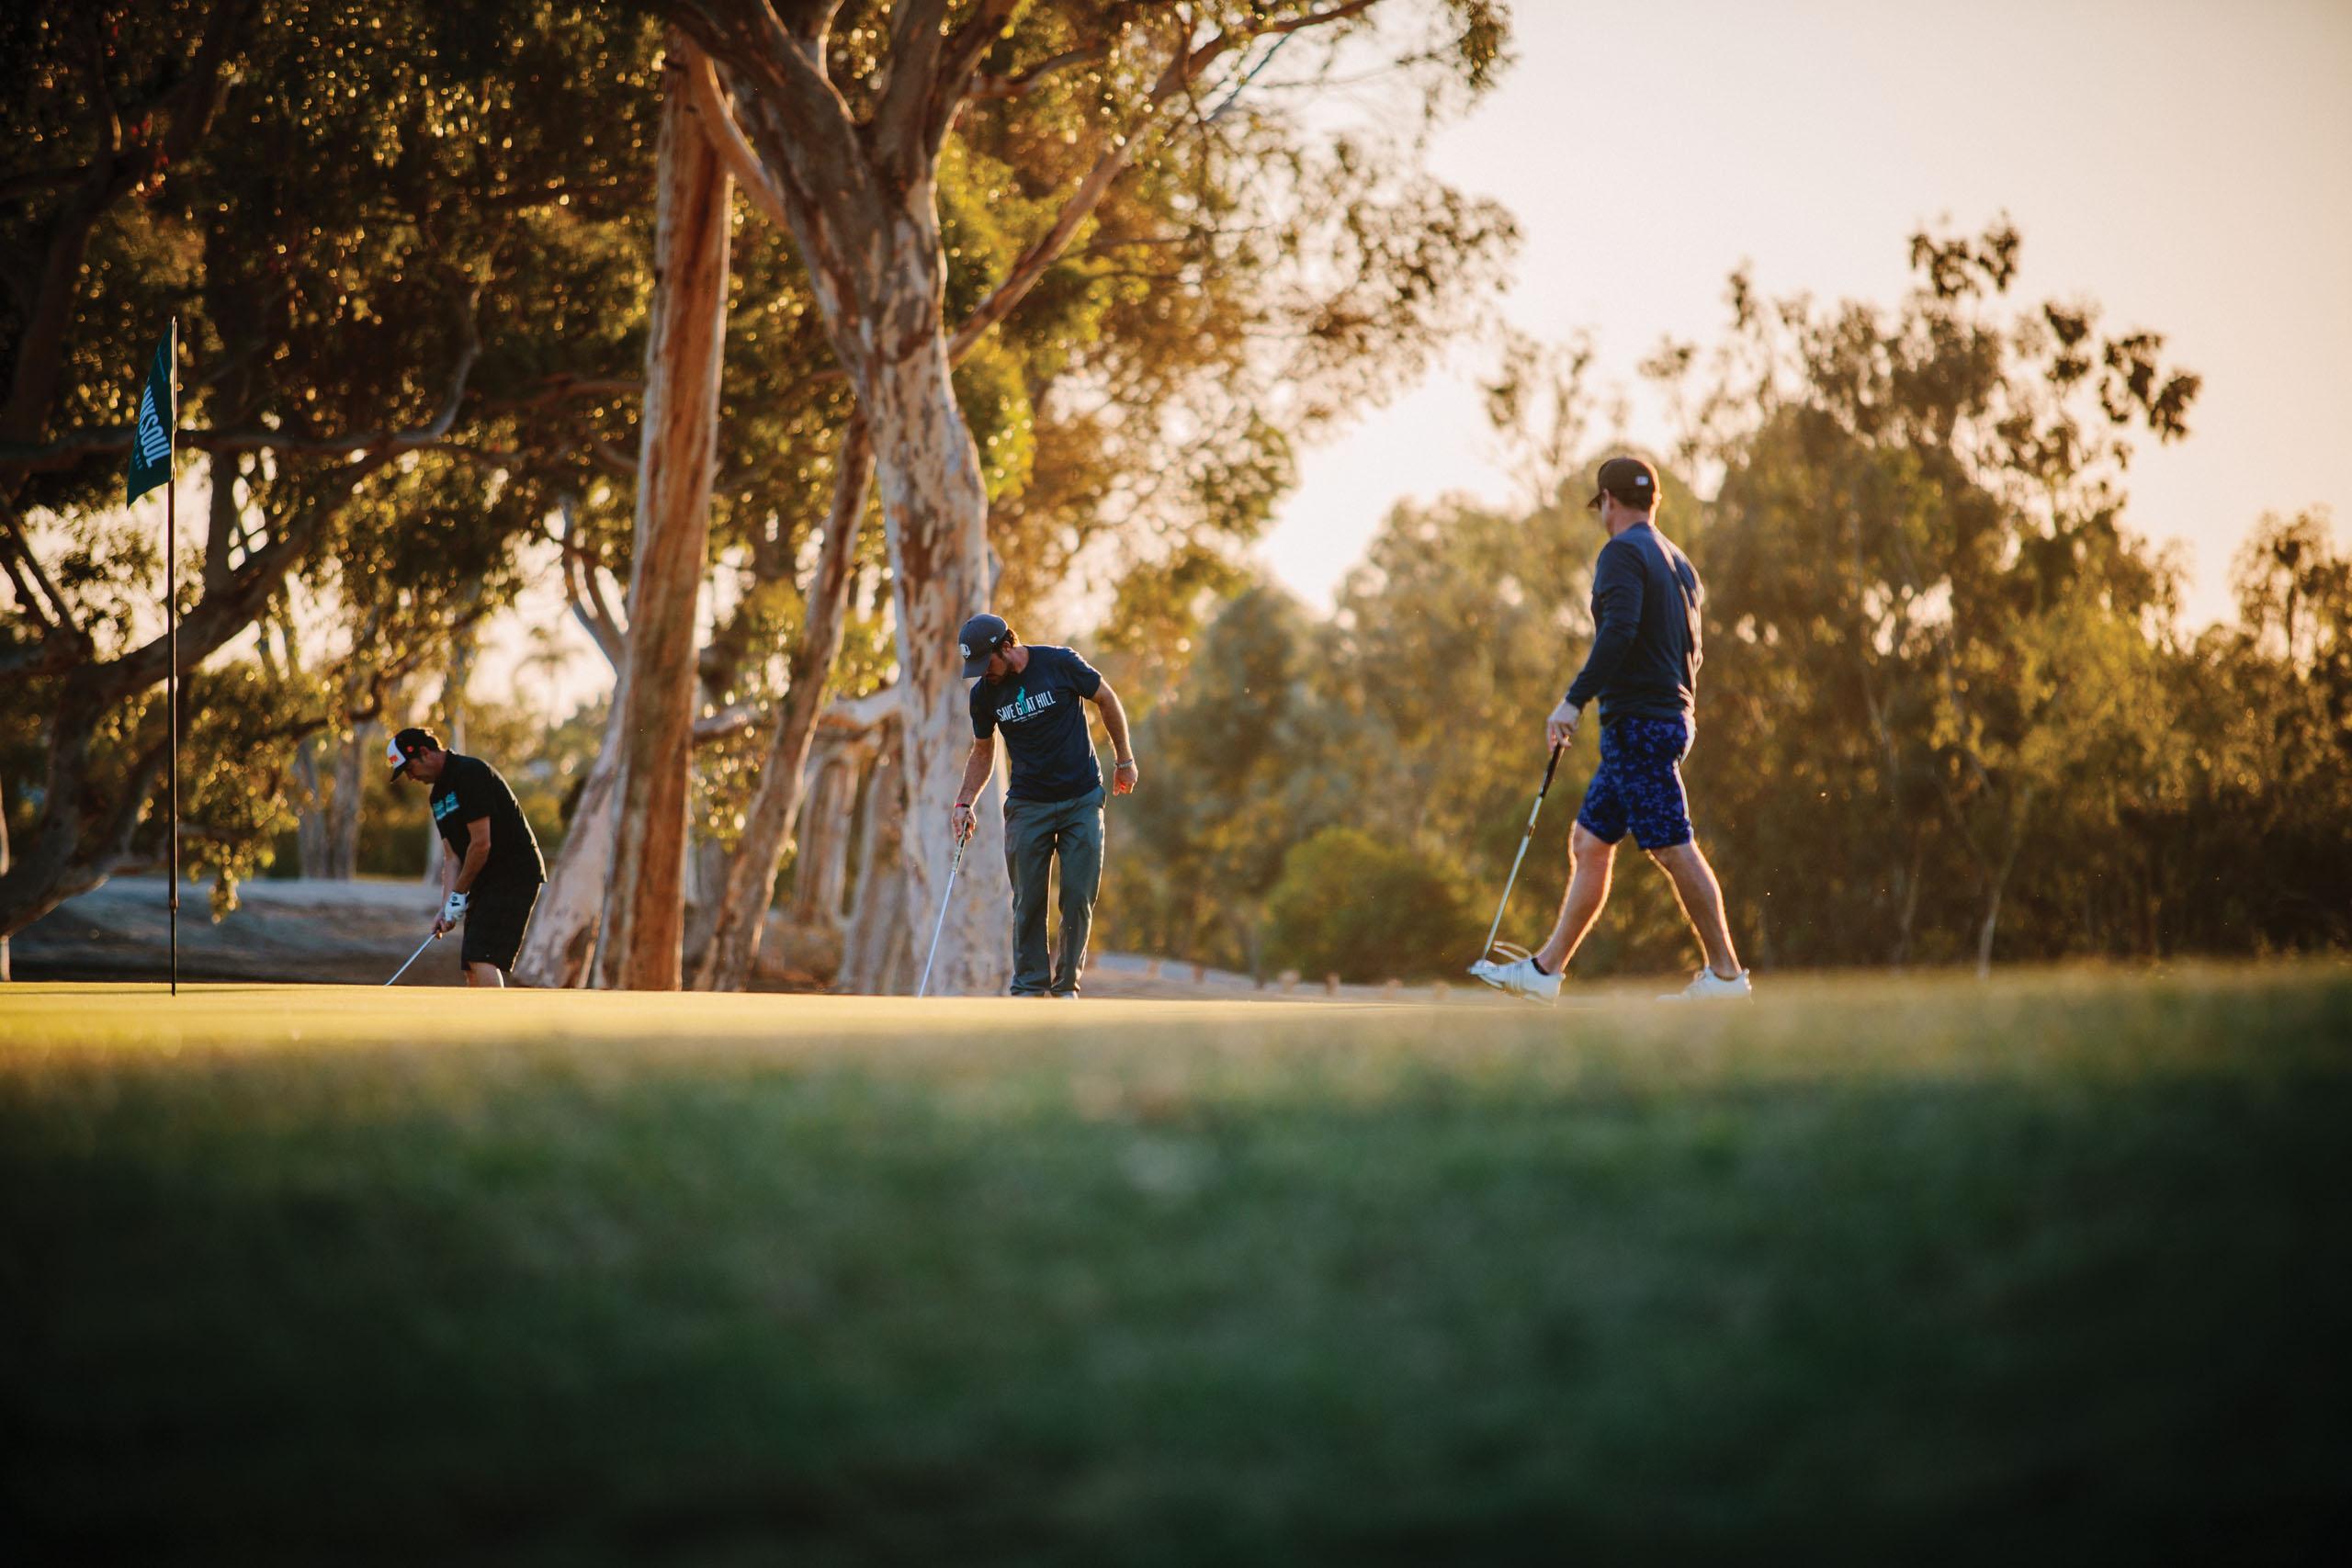 Golfer's at sunset